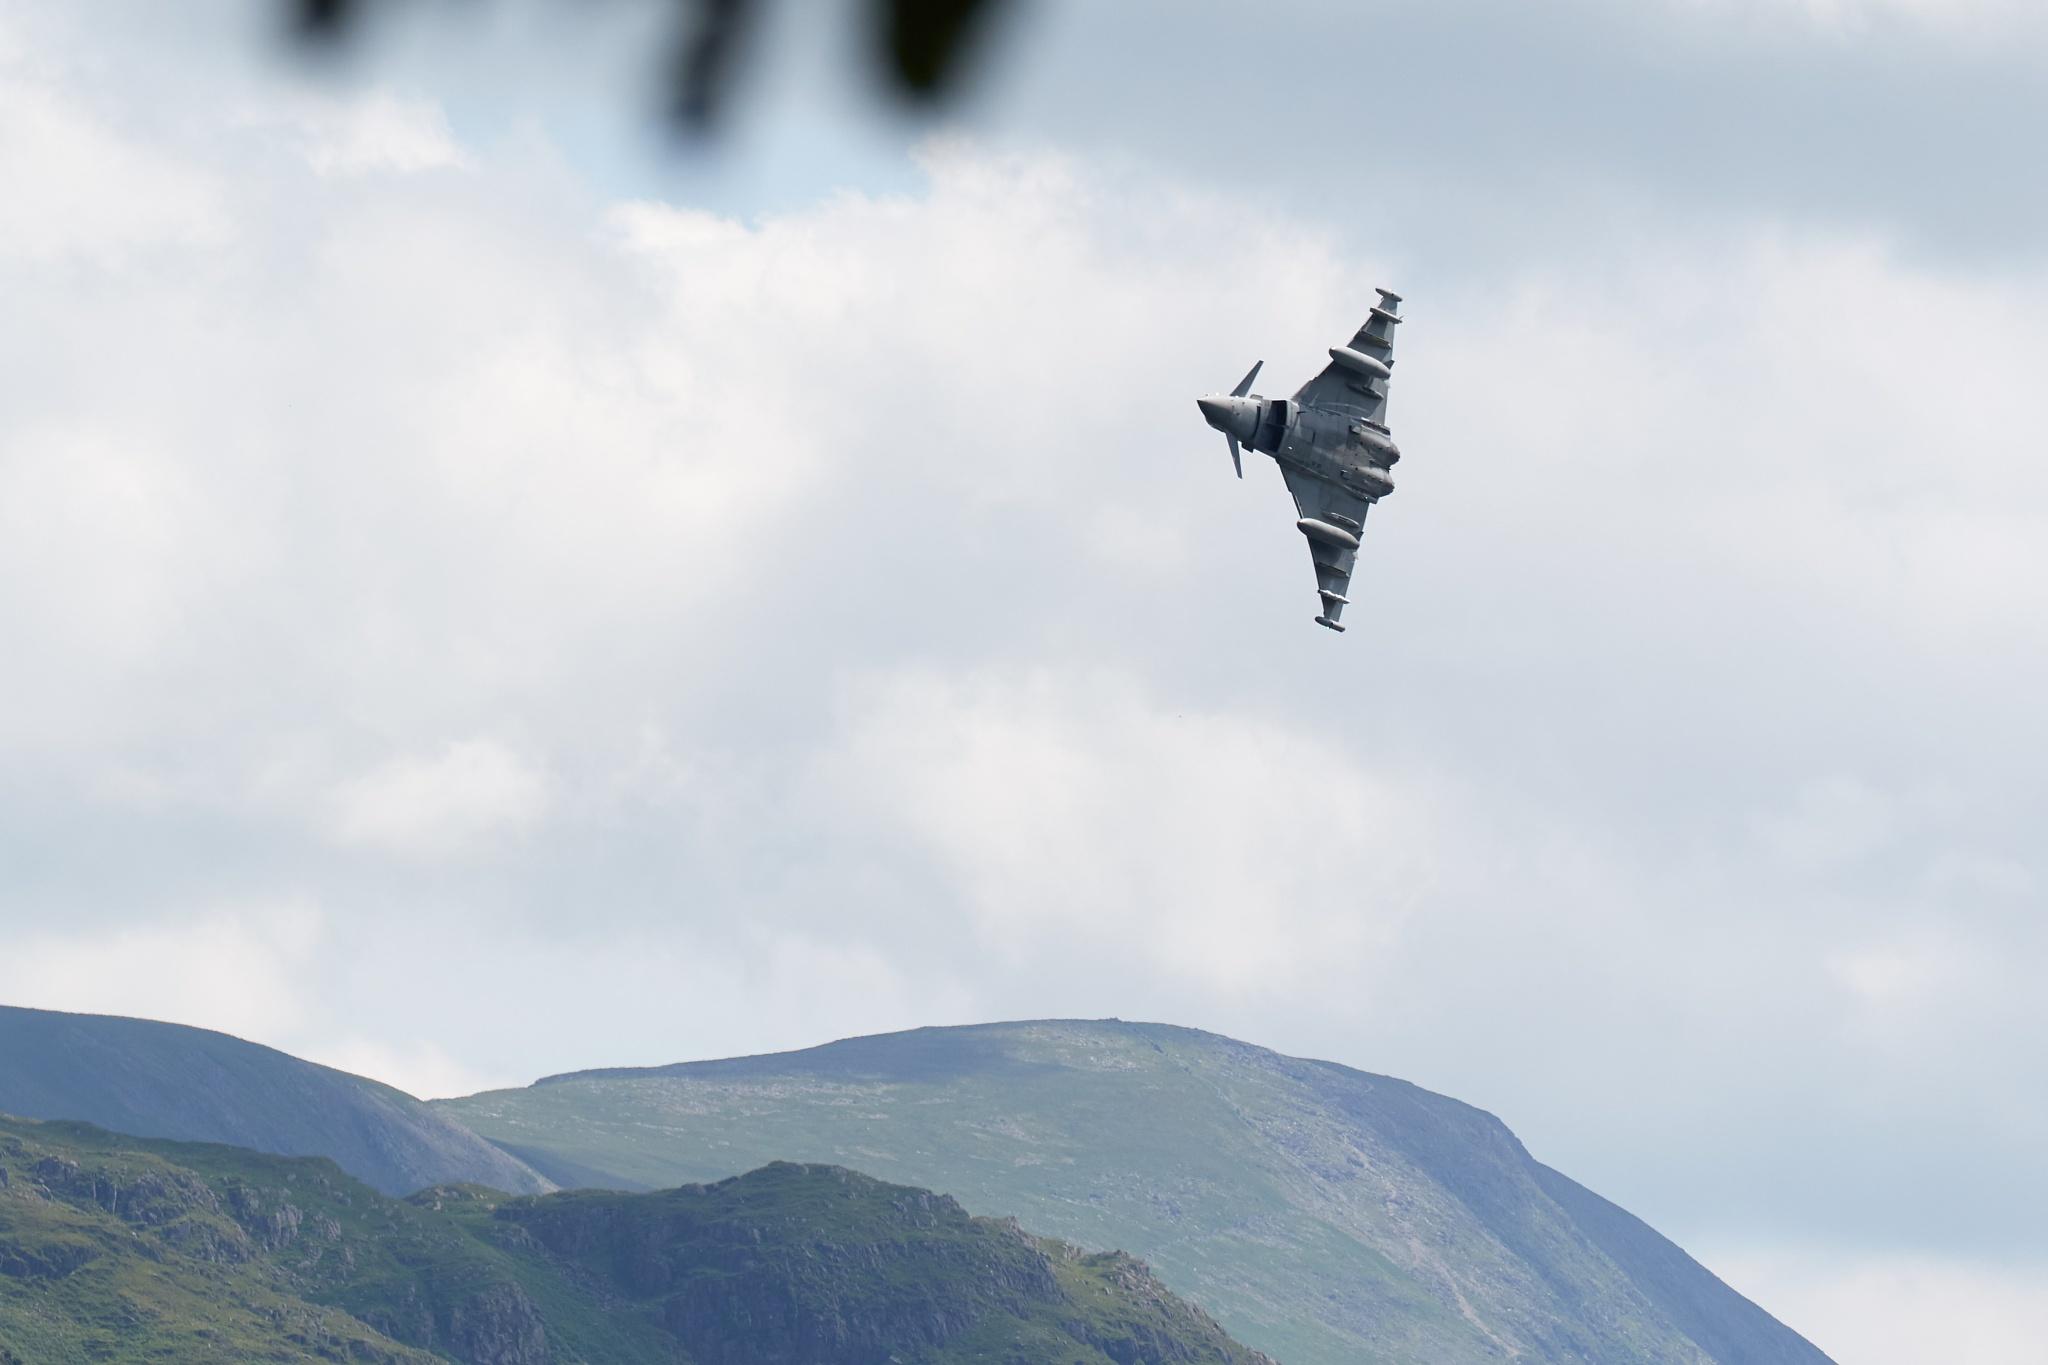 RAF Typhoon buzzes Ullswater Lake by FotoByA